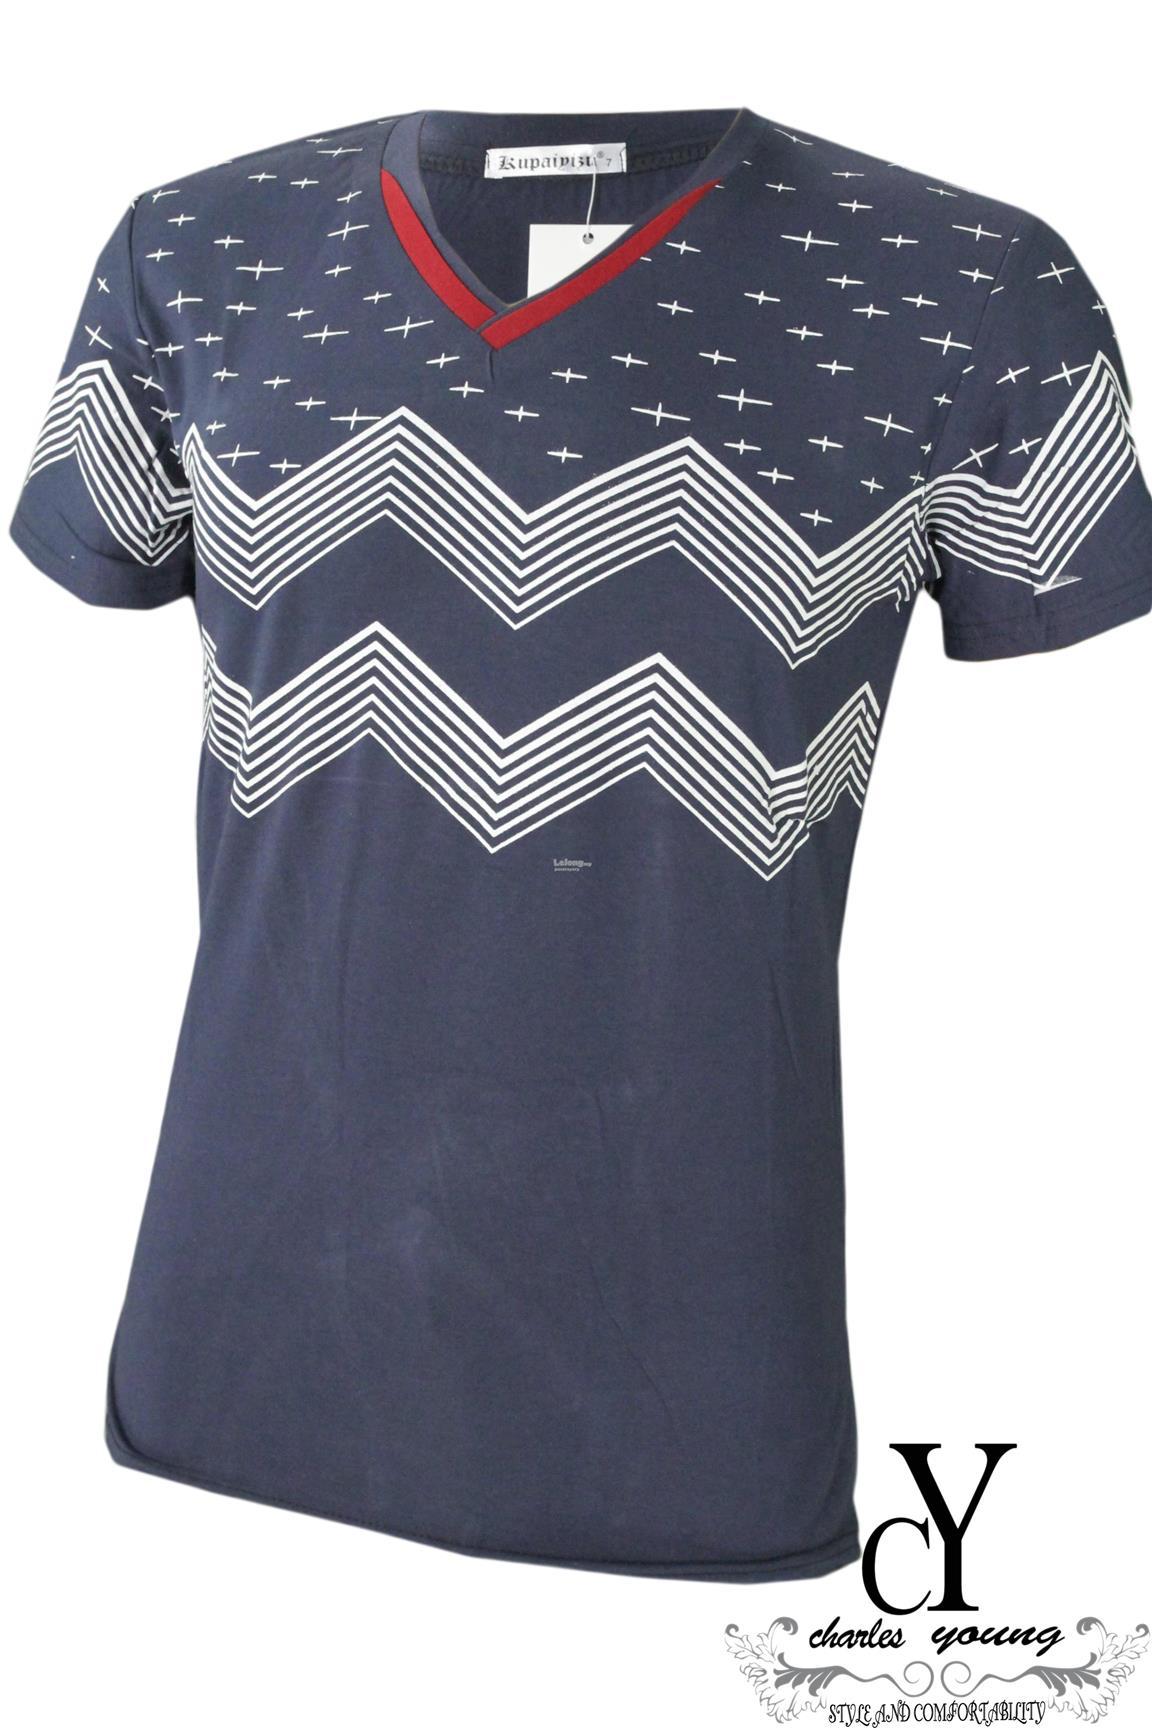 Stores sale korea men t 2017 malaysia for shirts on scott ireland